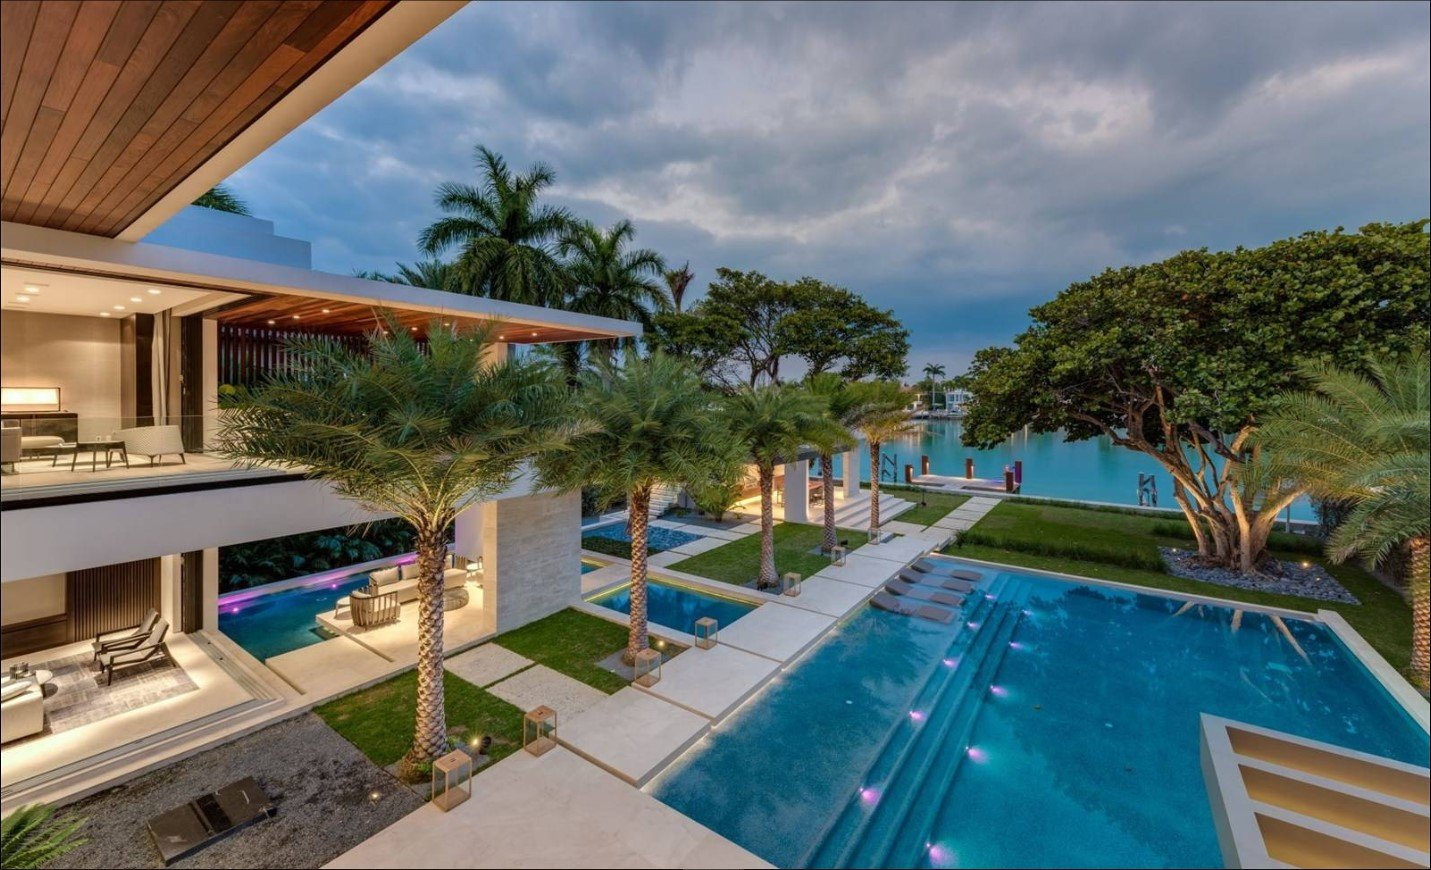 Luxury Home Builders in Miami - What Are The Advantages of Hiring Graziano La Grasta Construction, Inc?